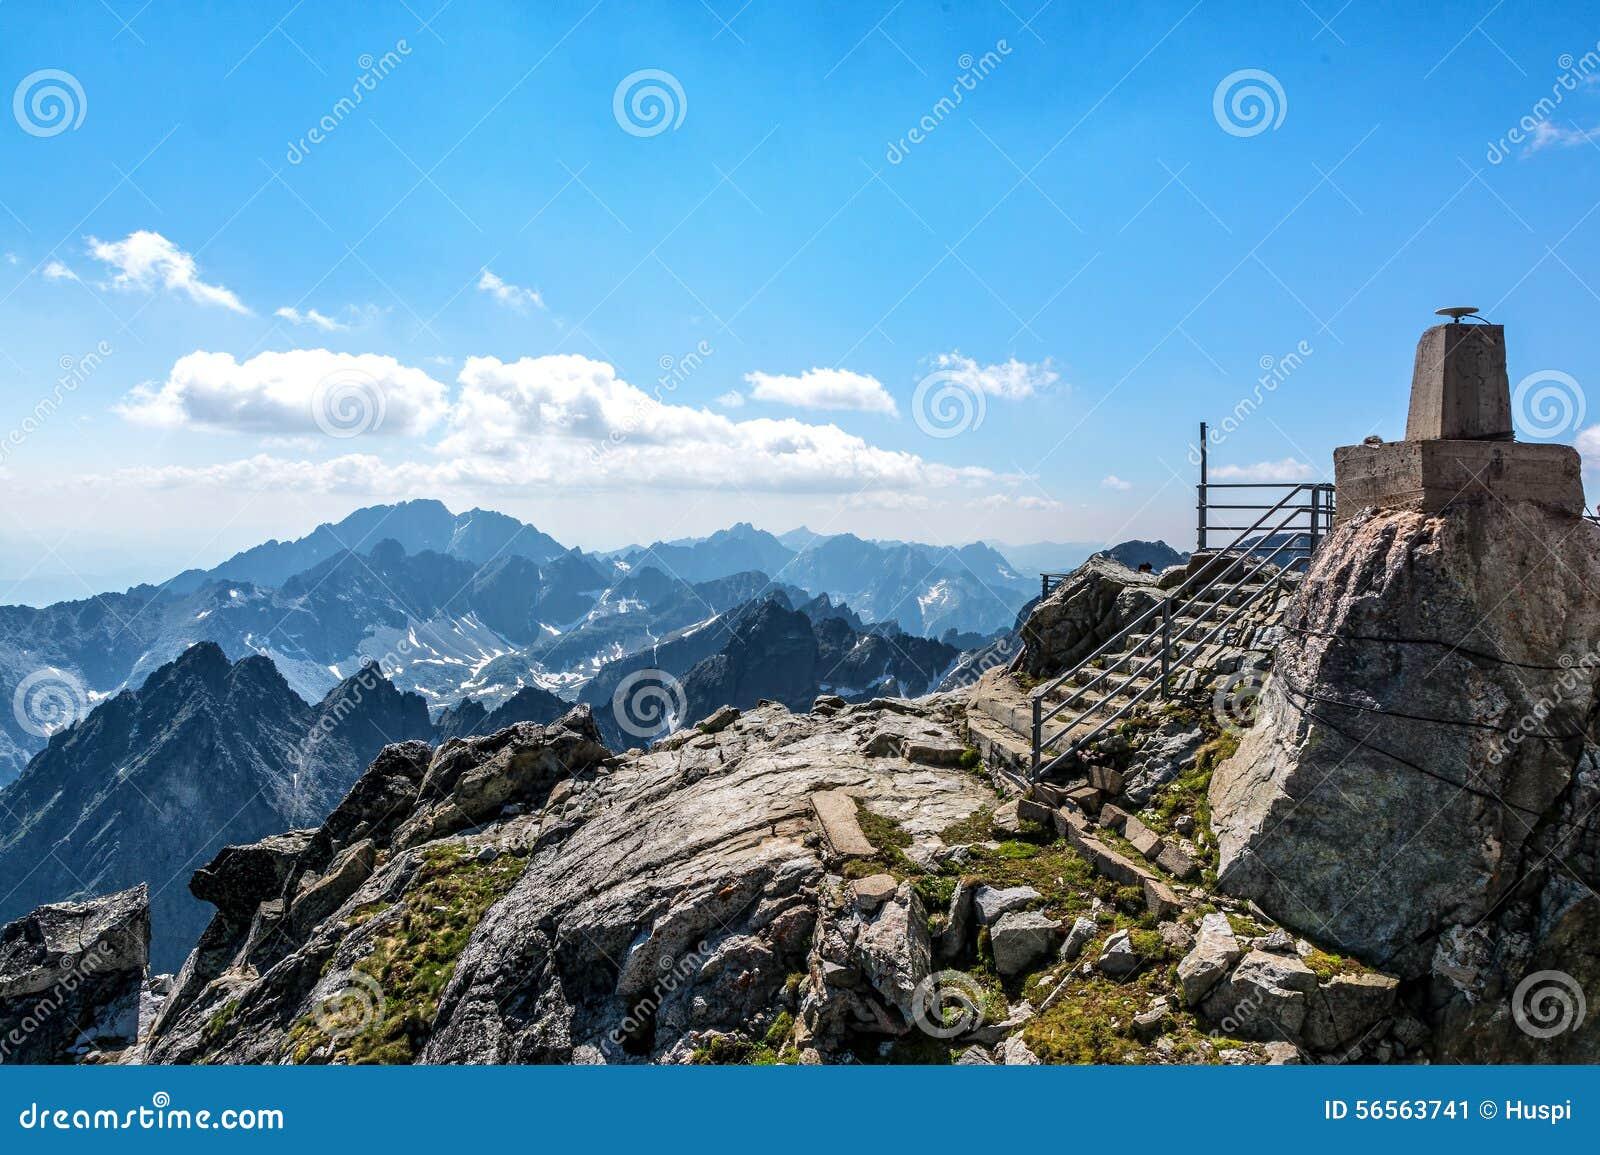 Download Υψηλό Tatras, τοπίο από Lomnicky Stit Στοκ Εικόνα - εικόνα από όψη, αιχμή: 56563741